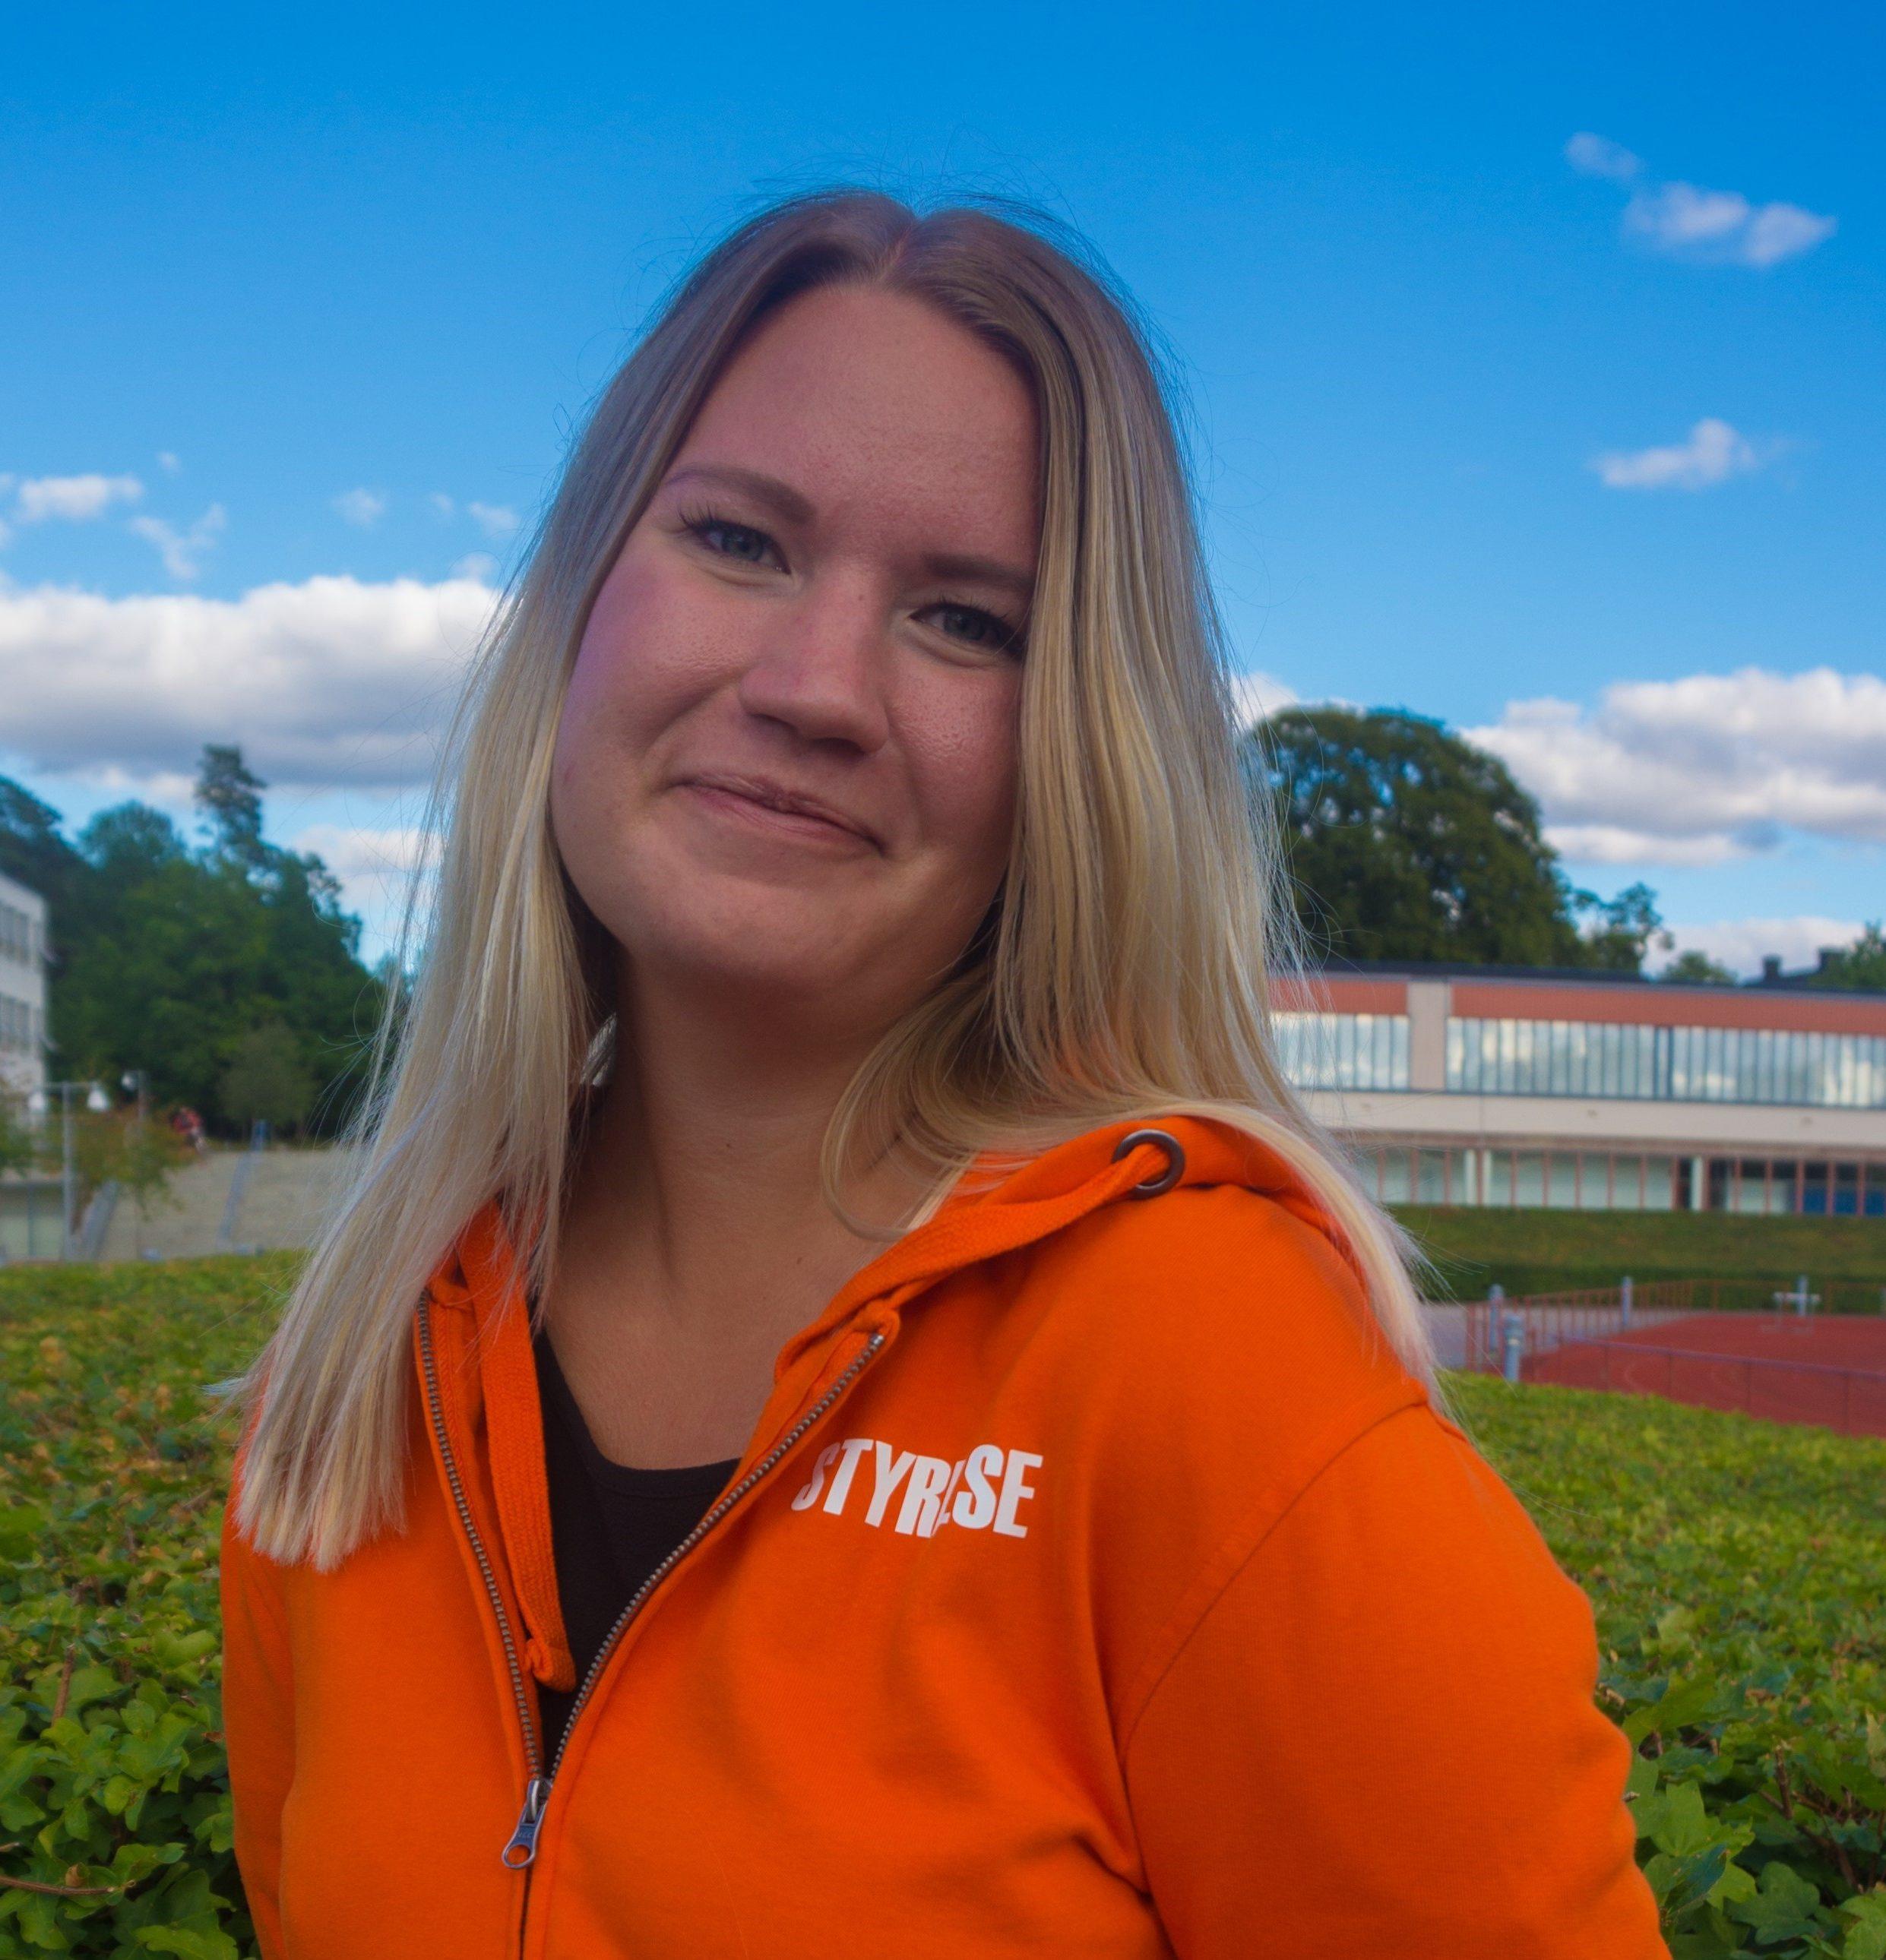 Rebecca Jylhäsalmi